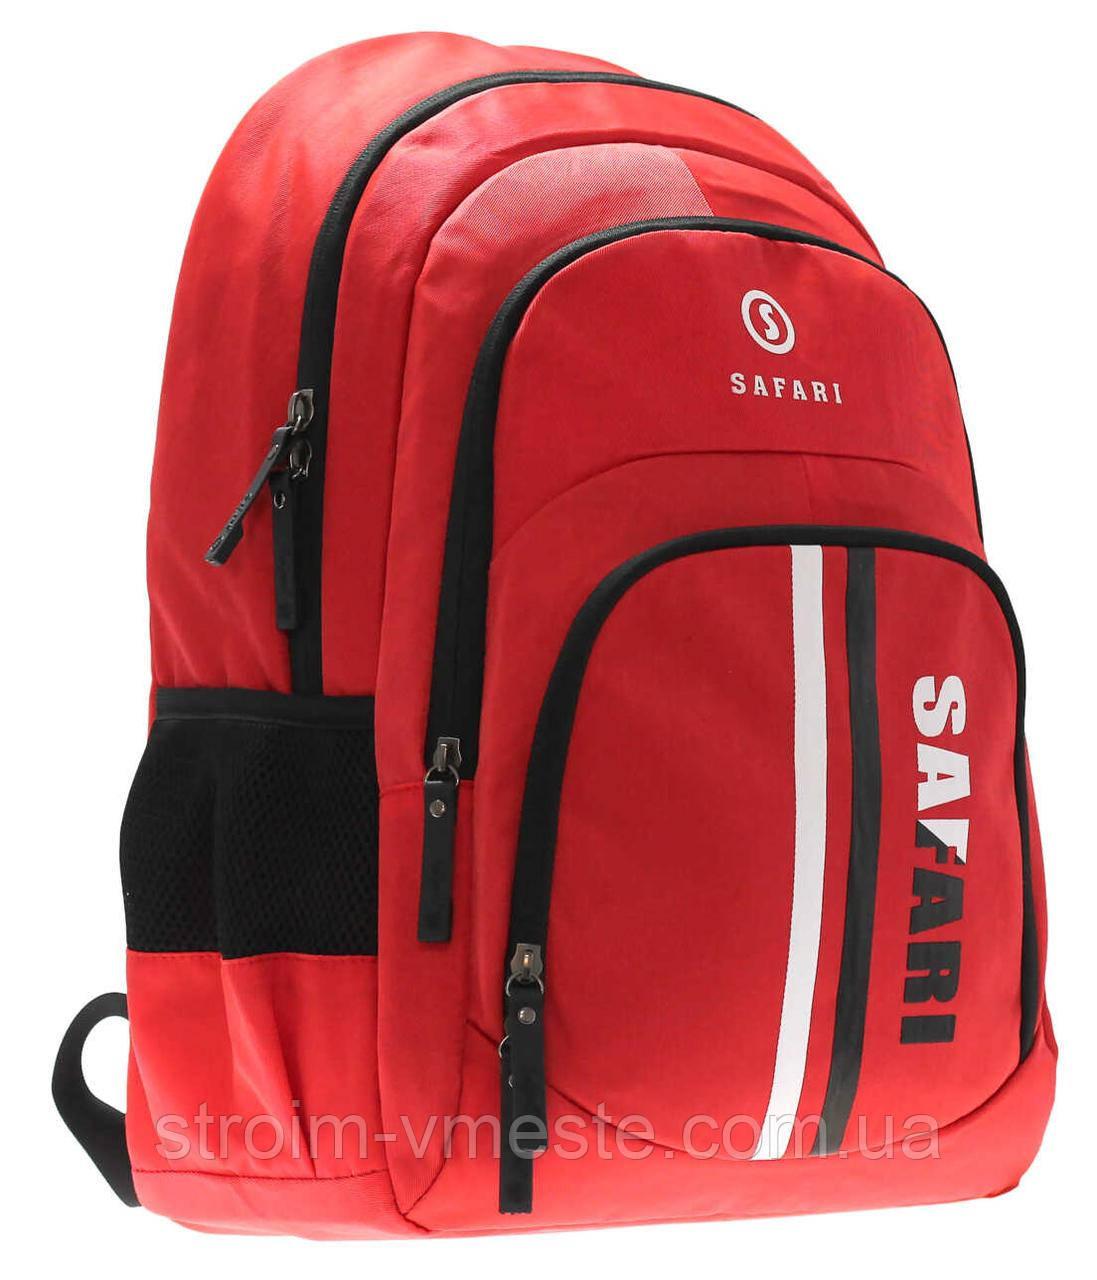 Рюкзак, 2 отделения, 45*31*18см, PL, Safari Sport, 19-134L-1, SAFARI